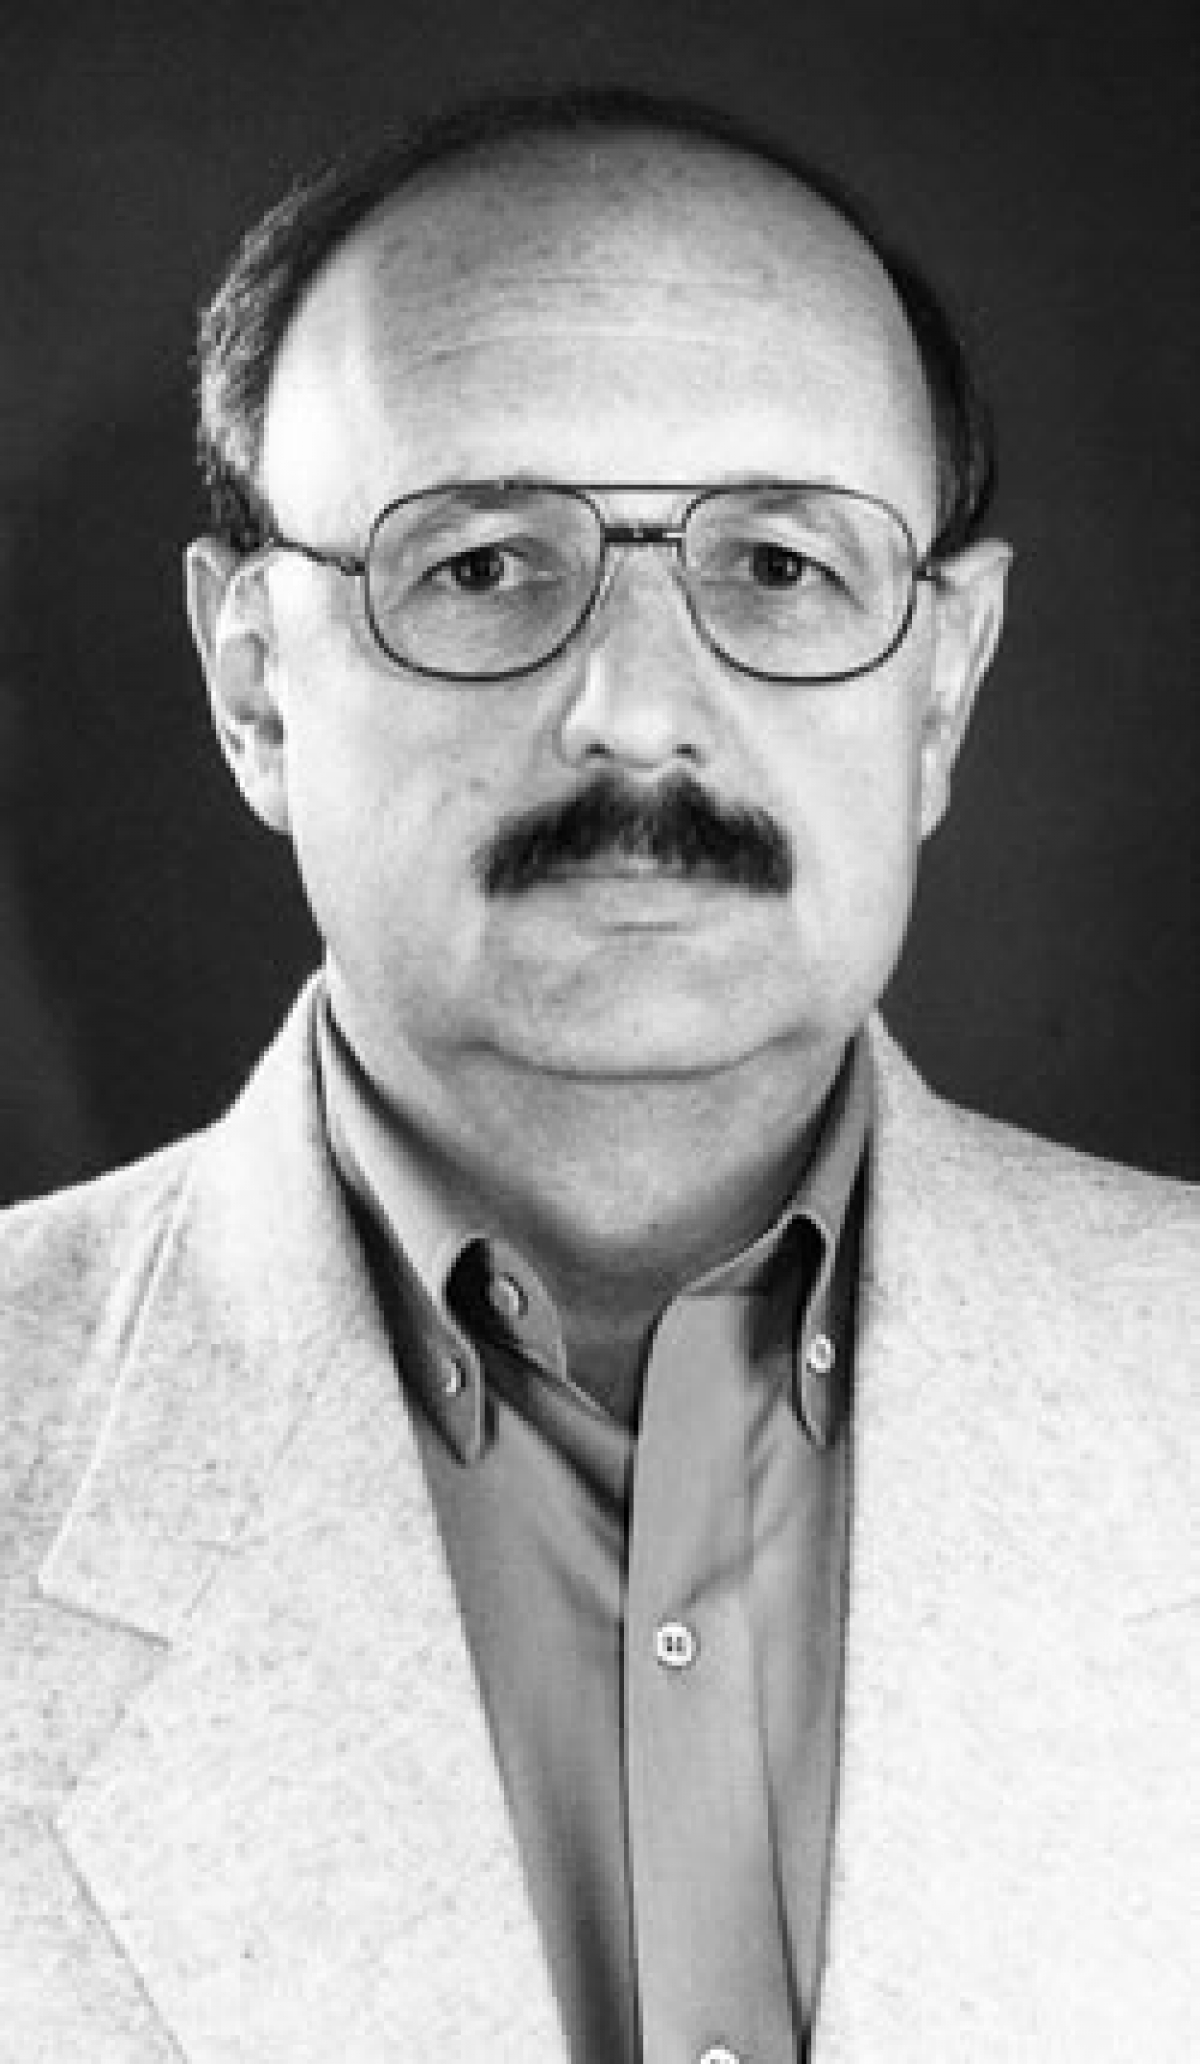 EMILIO GAZANIGA NETO